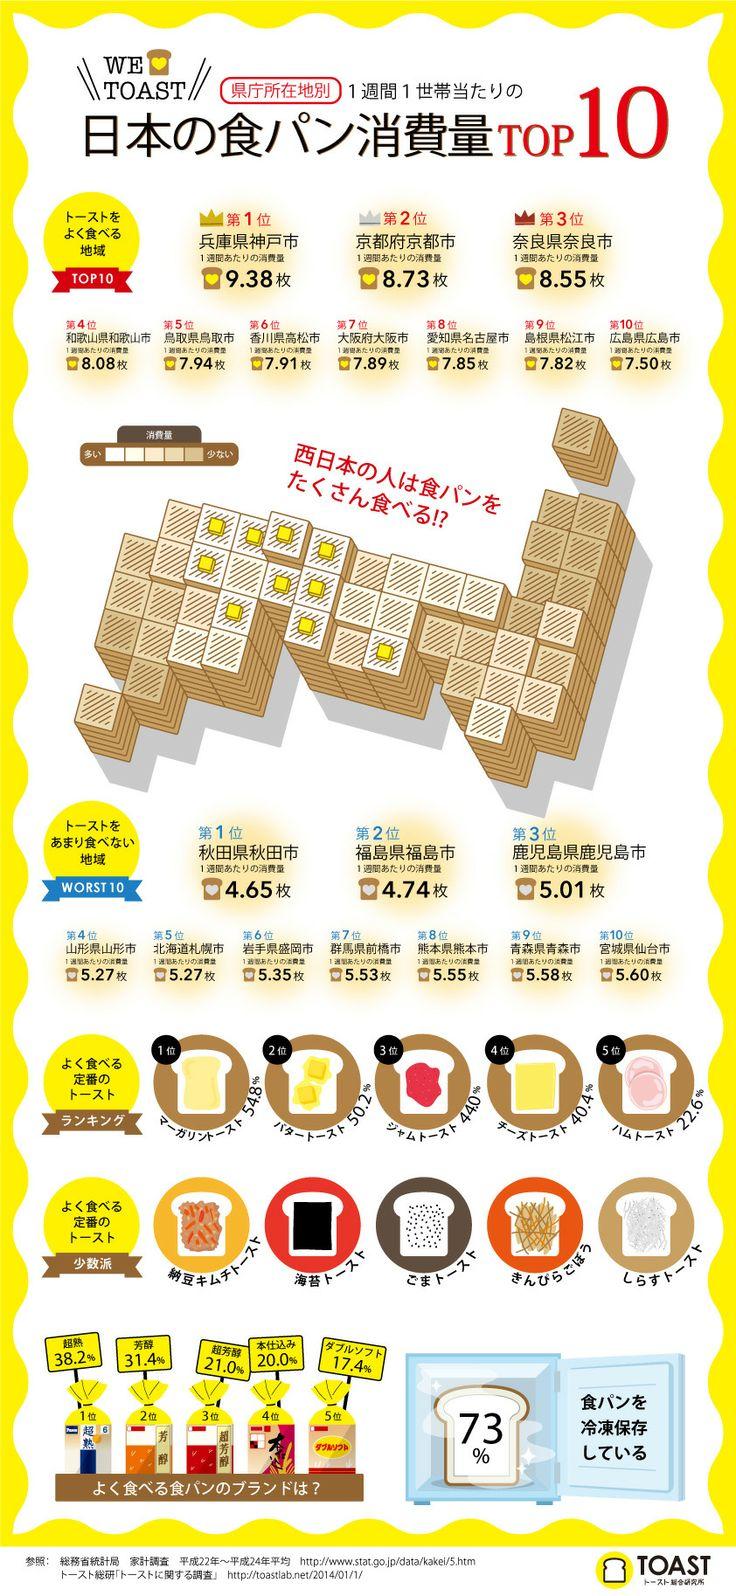 infogra.me(インフォグラミー)| 県庁所在地別・日本の食パン消費量&食パンブランドランキング!がわかるインフォグラフィック